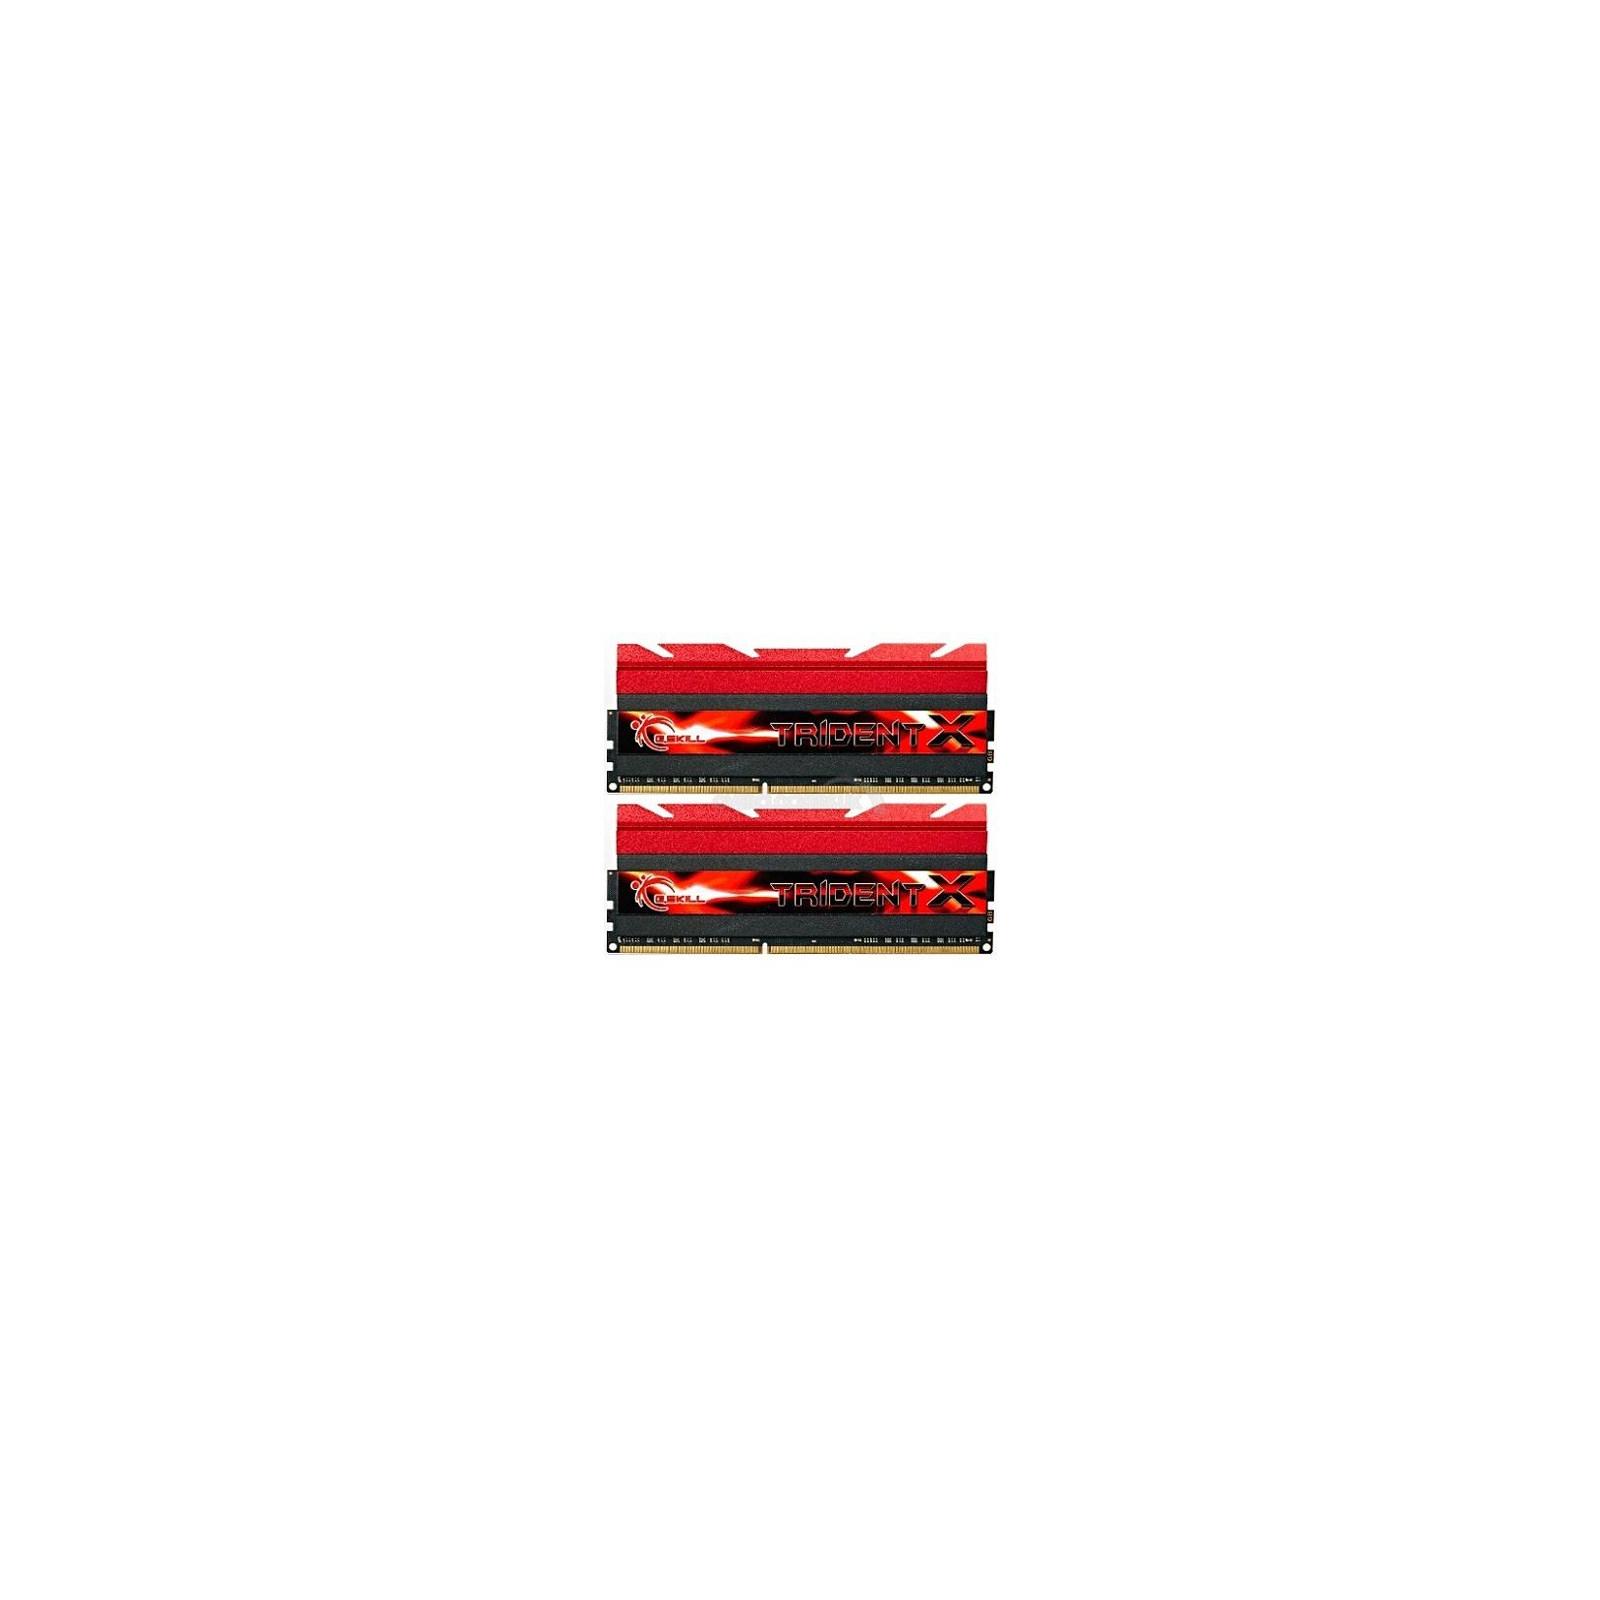 Модуль памяти для компьютера DDR3 16GB (2x8GB) 2400 MHz G.Skill (F3-2400C10D-16GTX)